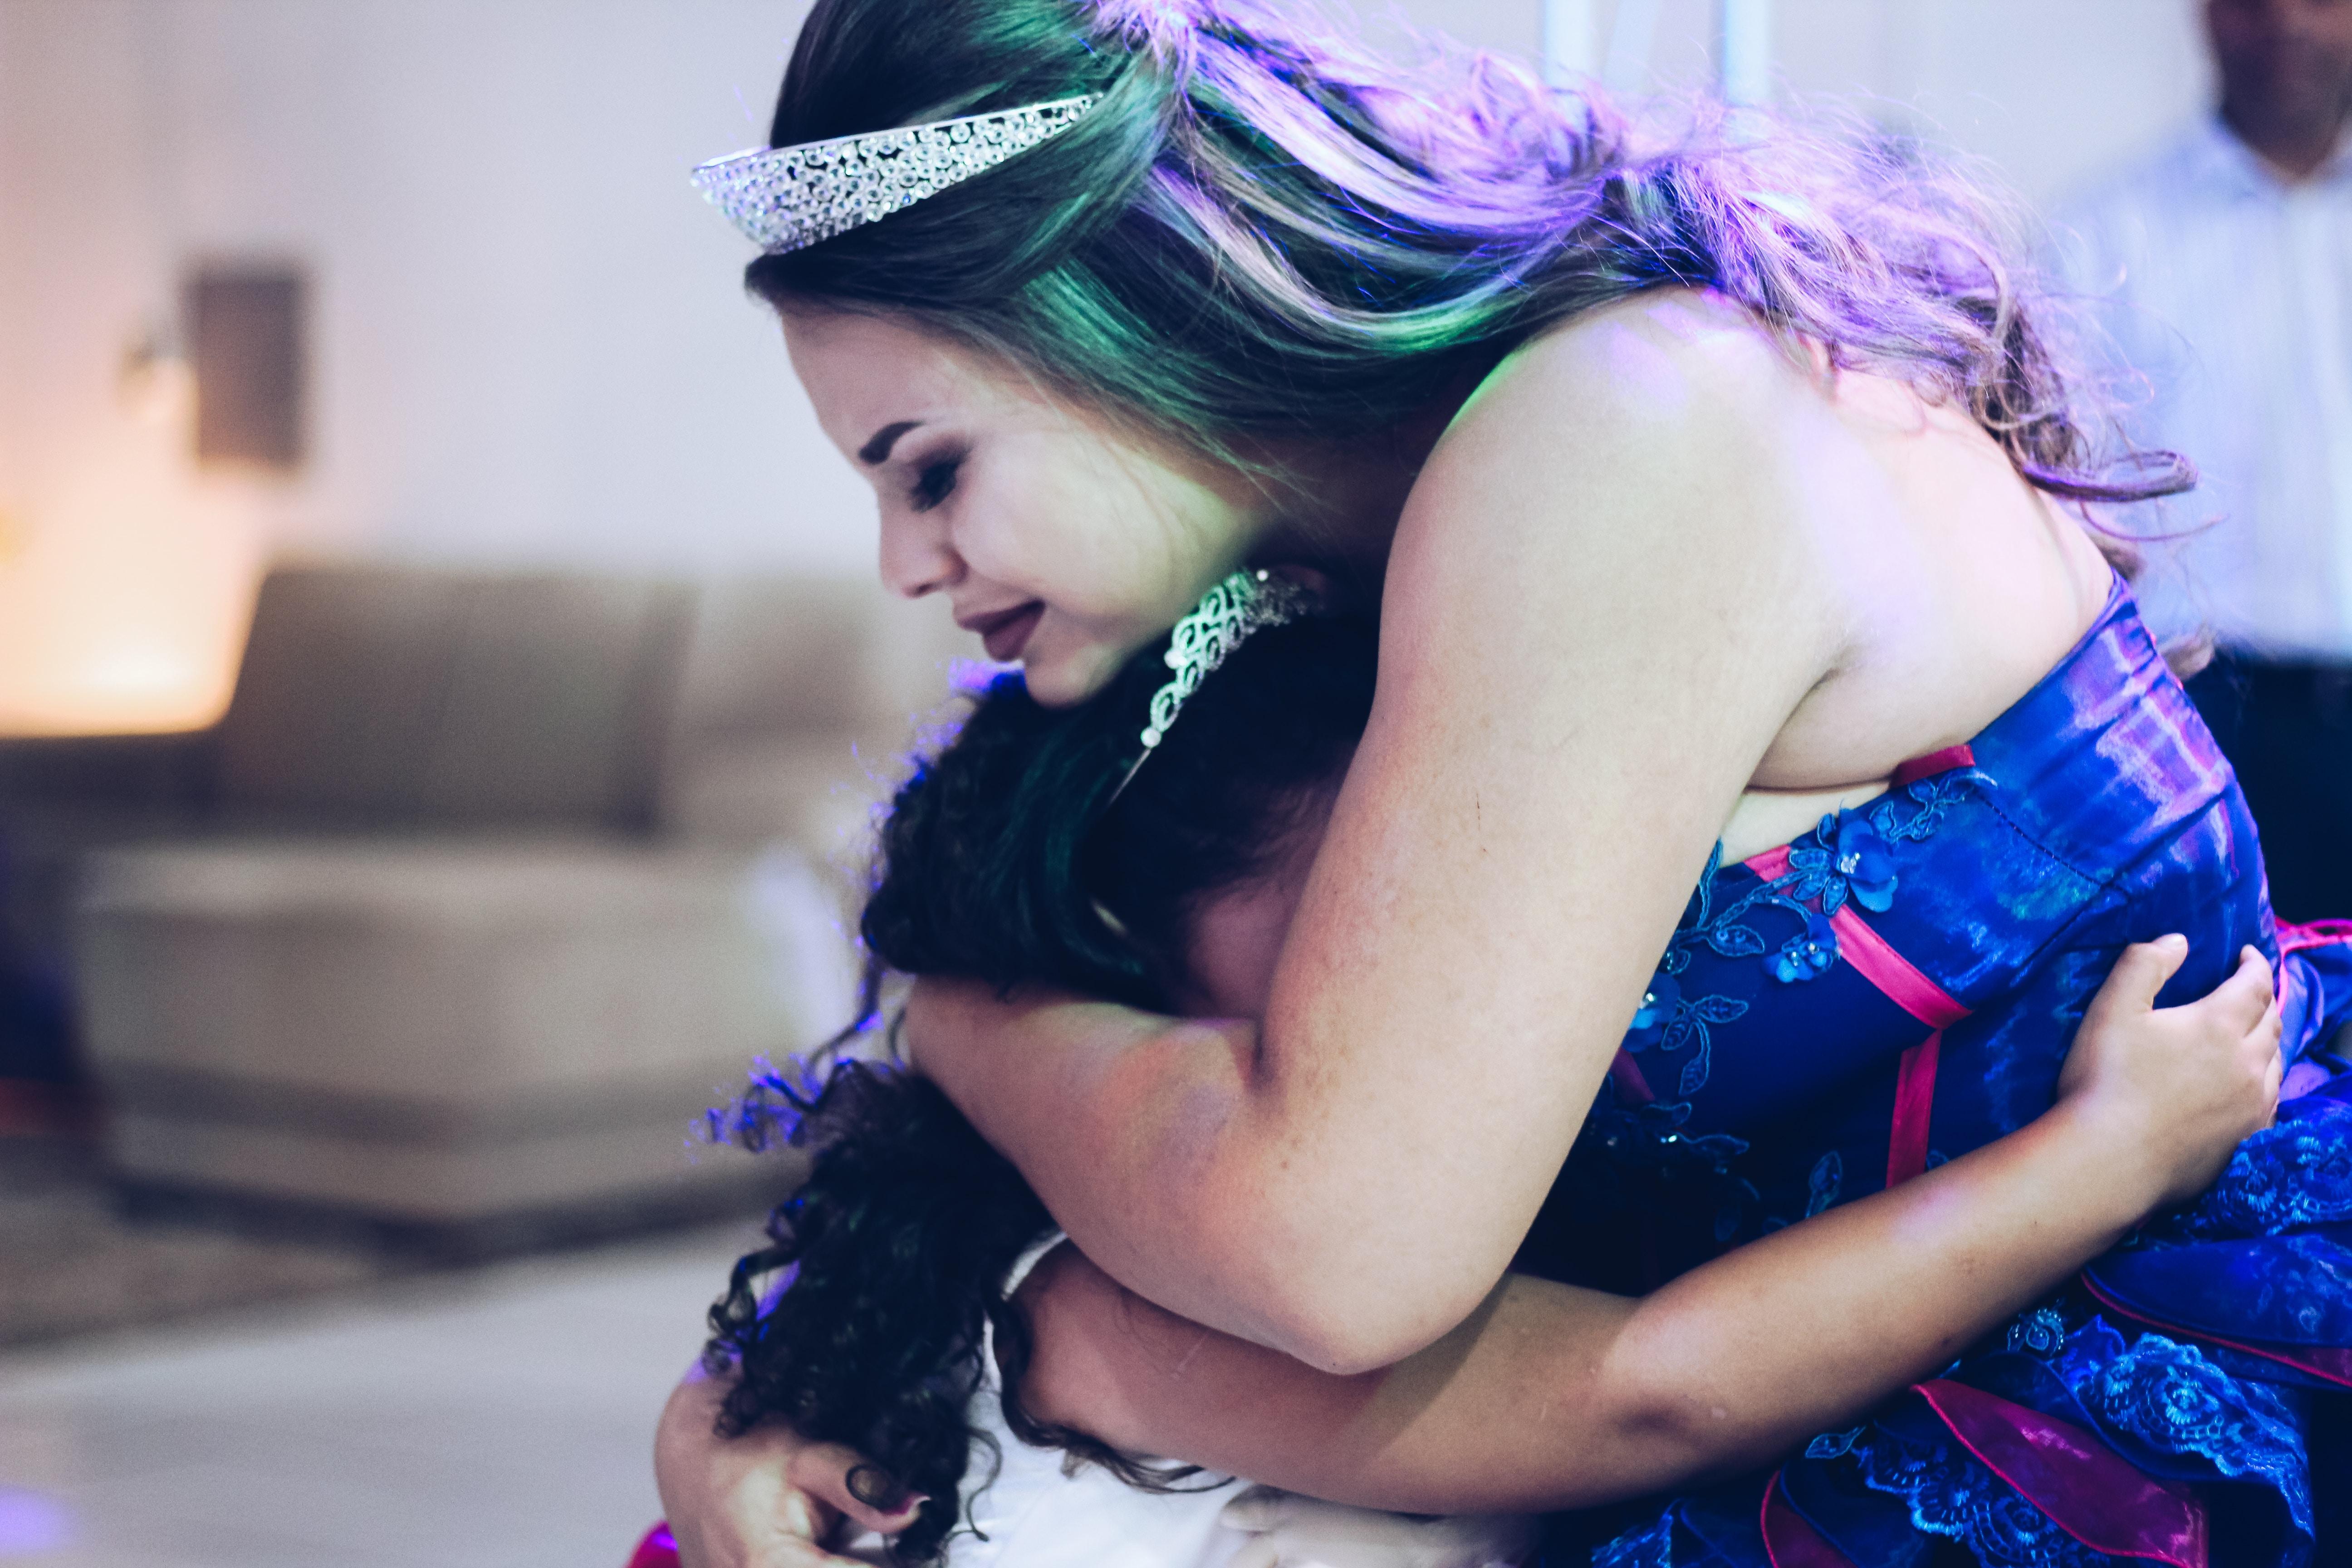 woman hugging girl inside room